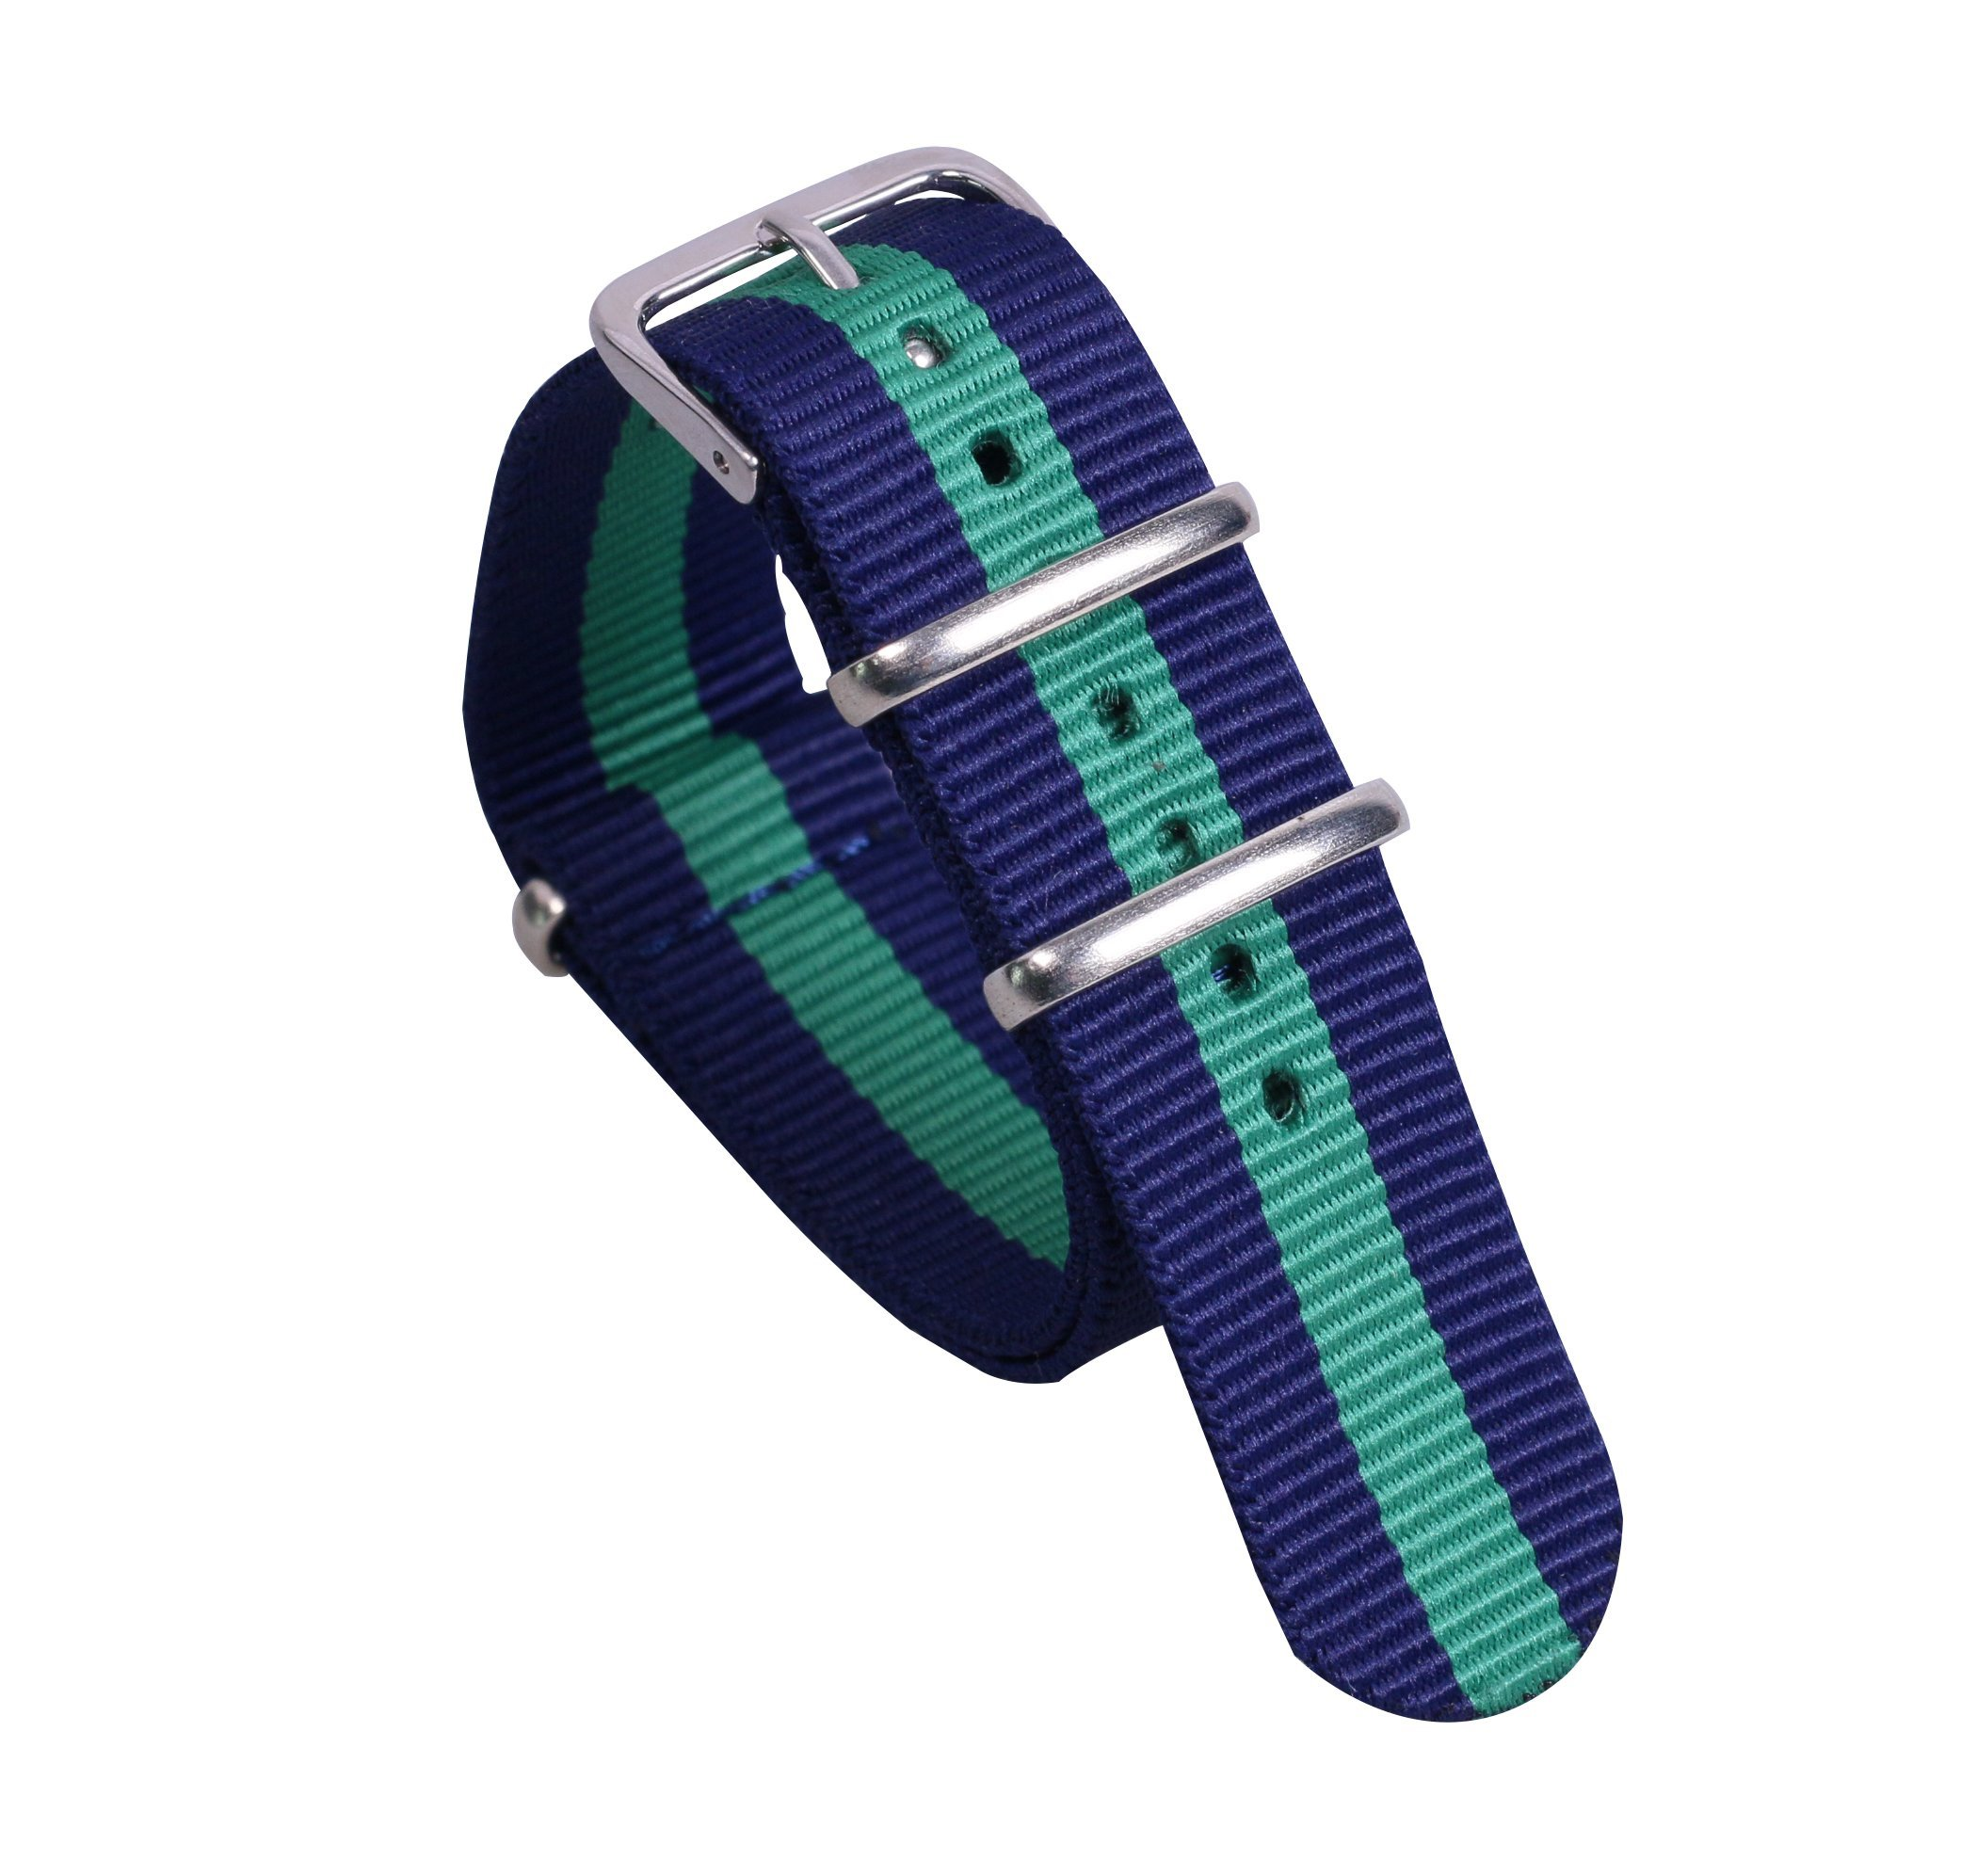 12mm Dark Blue/Green/Dark Blue Elegant Soft NATO style Nylon Watch Band Strap Replacement for Women